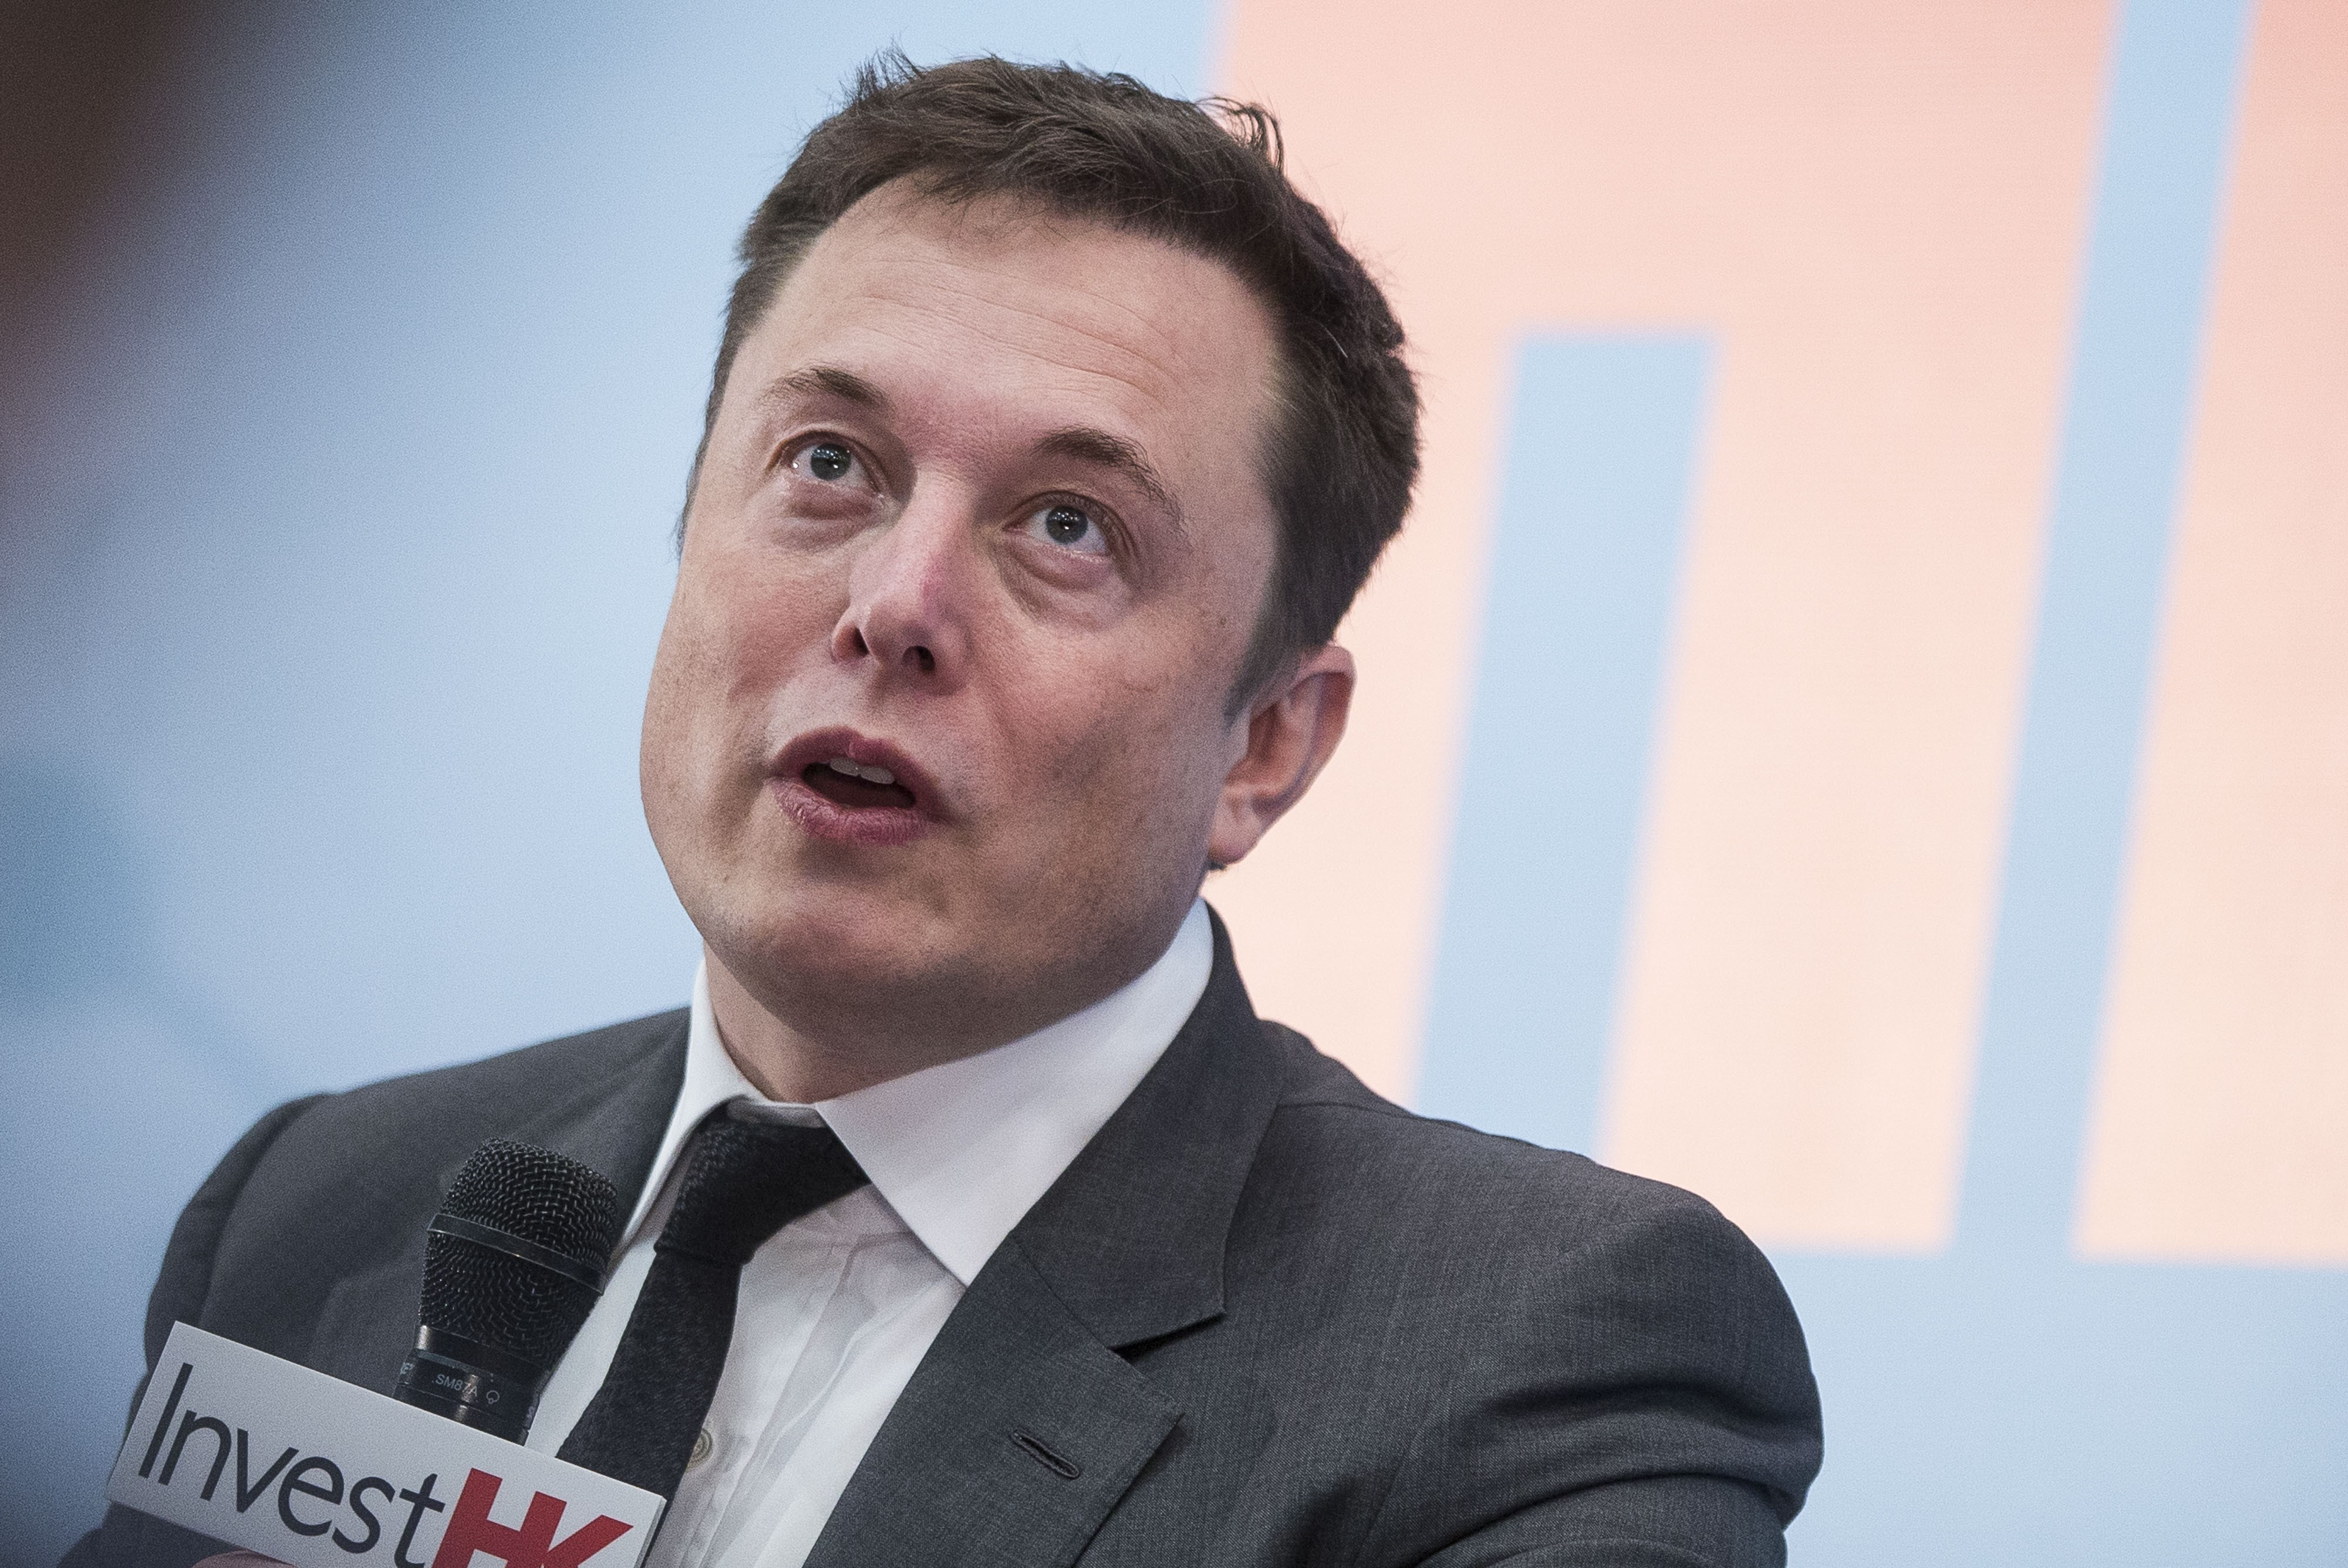 Tesla CEO and billionnaire Elon Musk